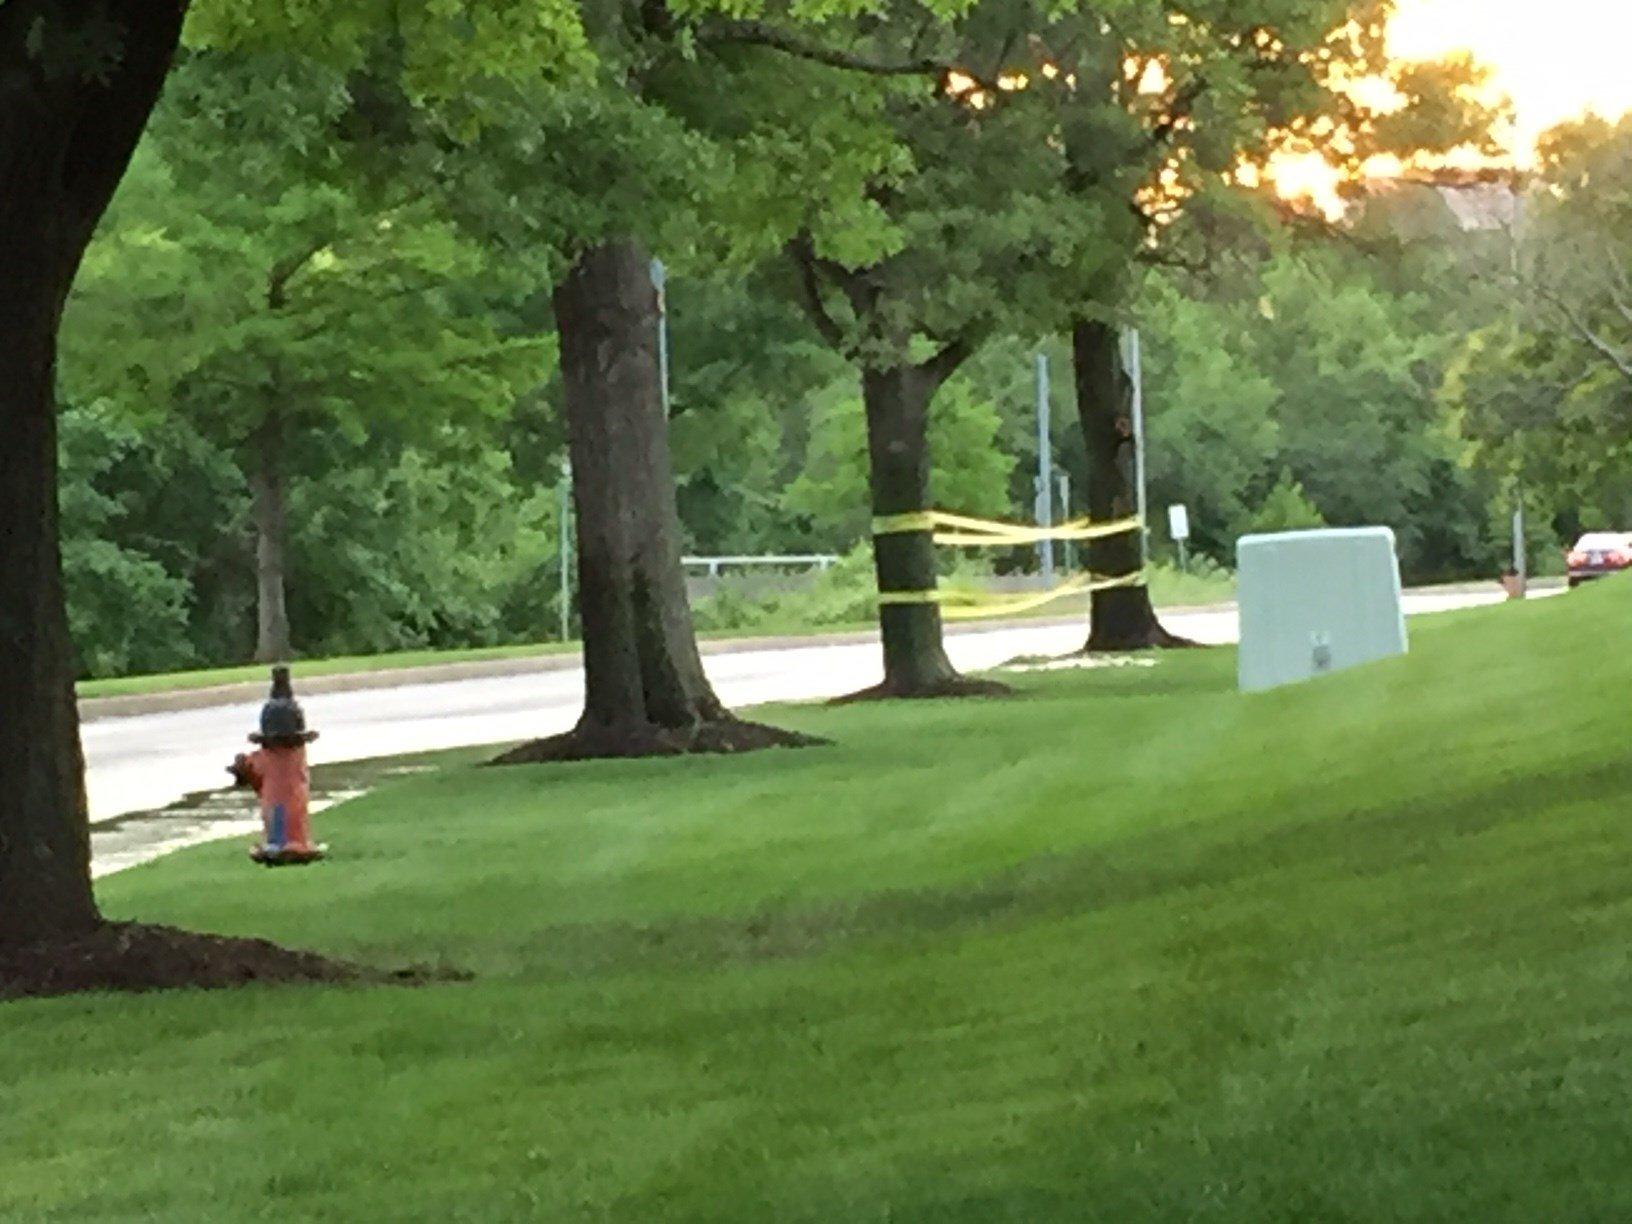 Shortly after 6 p.m., an 8-inch main water line broke. (Dwain Crispell/KCTV)